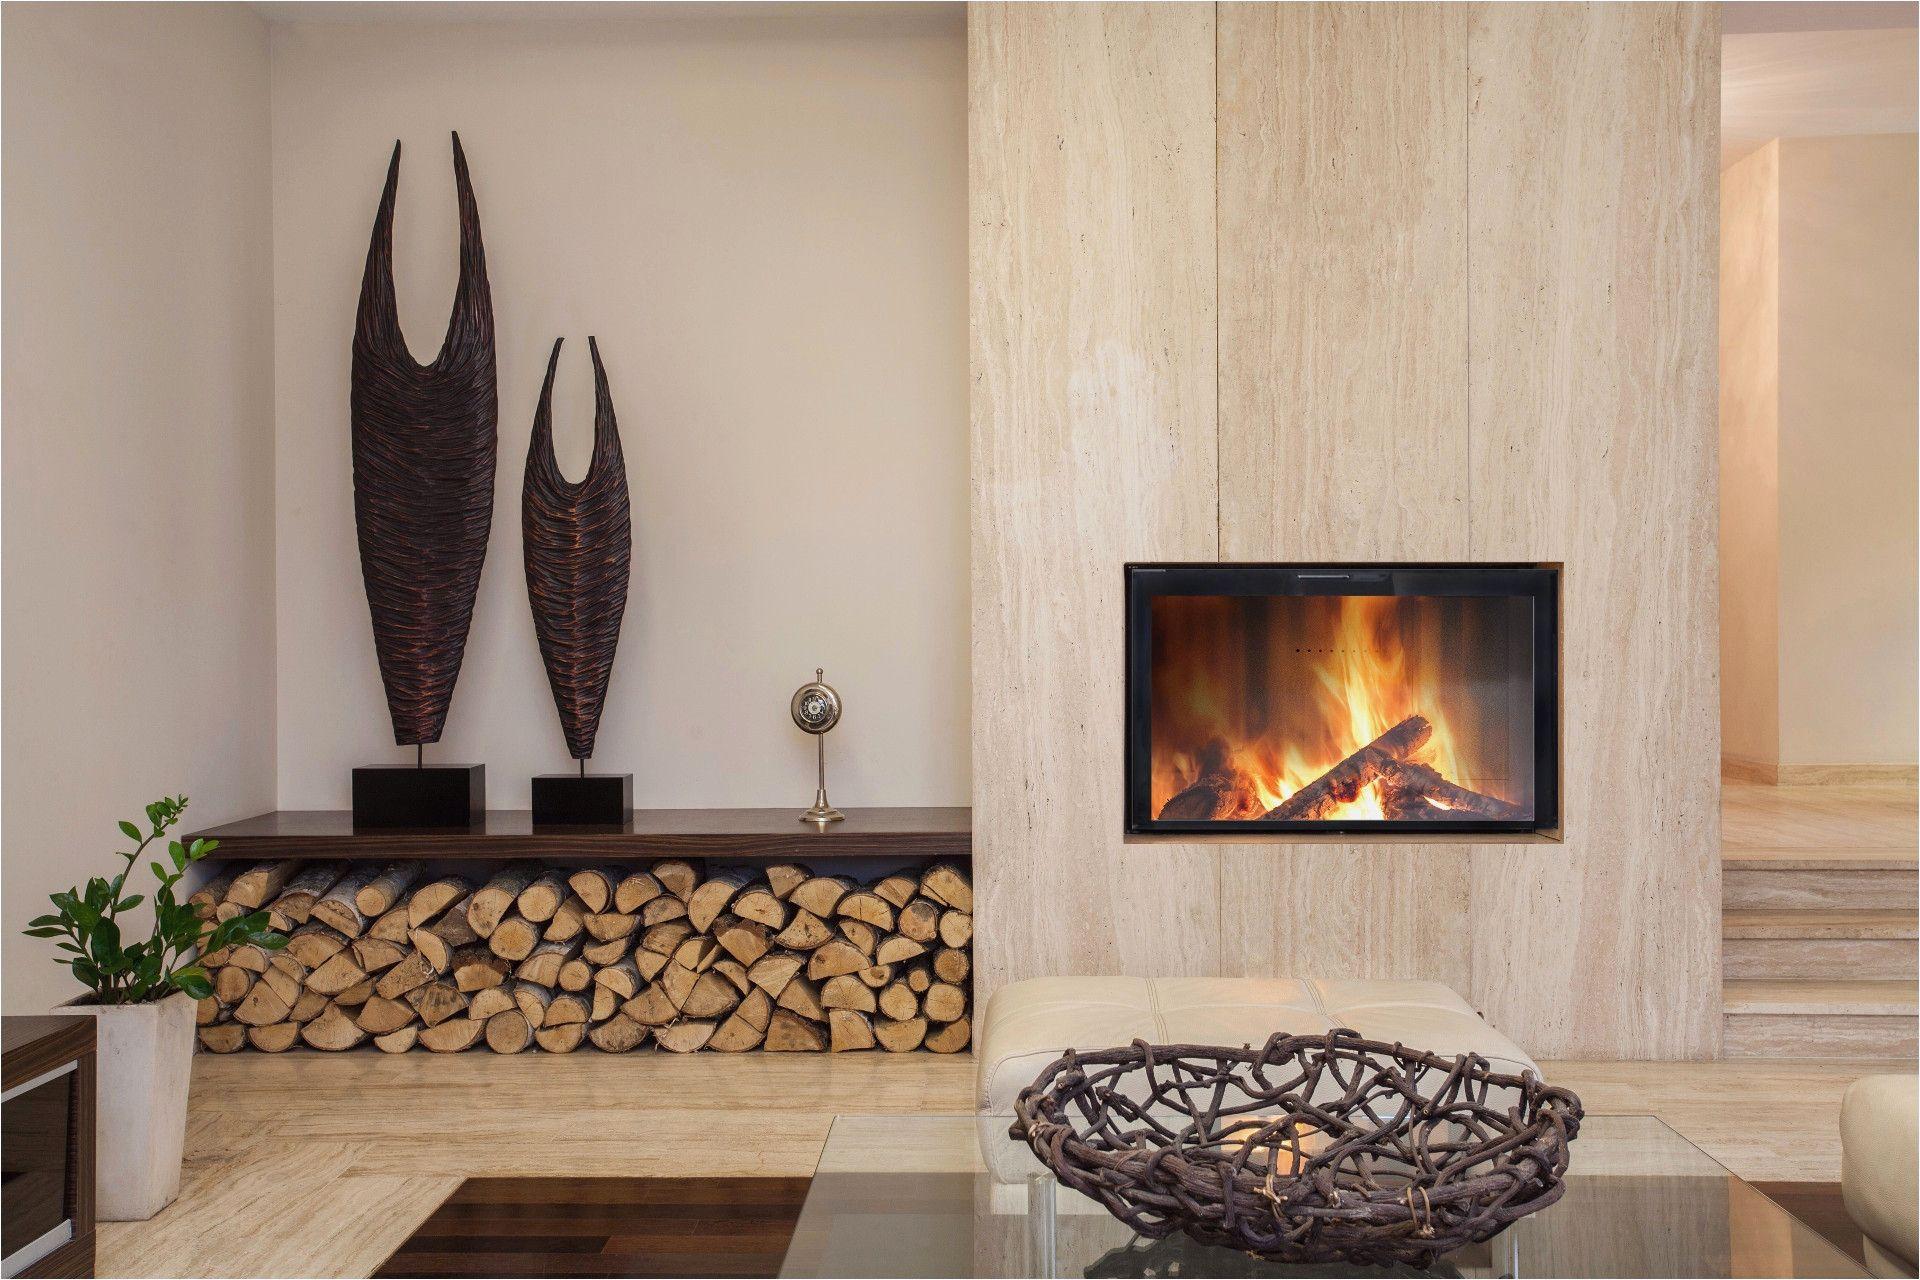 Cheminee Ethanol Murale Cheminee Ethanol Murale Cheminee Bio Ethanol Manomano Une Cheminee A Contemporary Fireplace Designs Modern Fireplace Fireplace Design